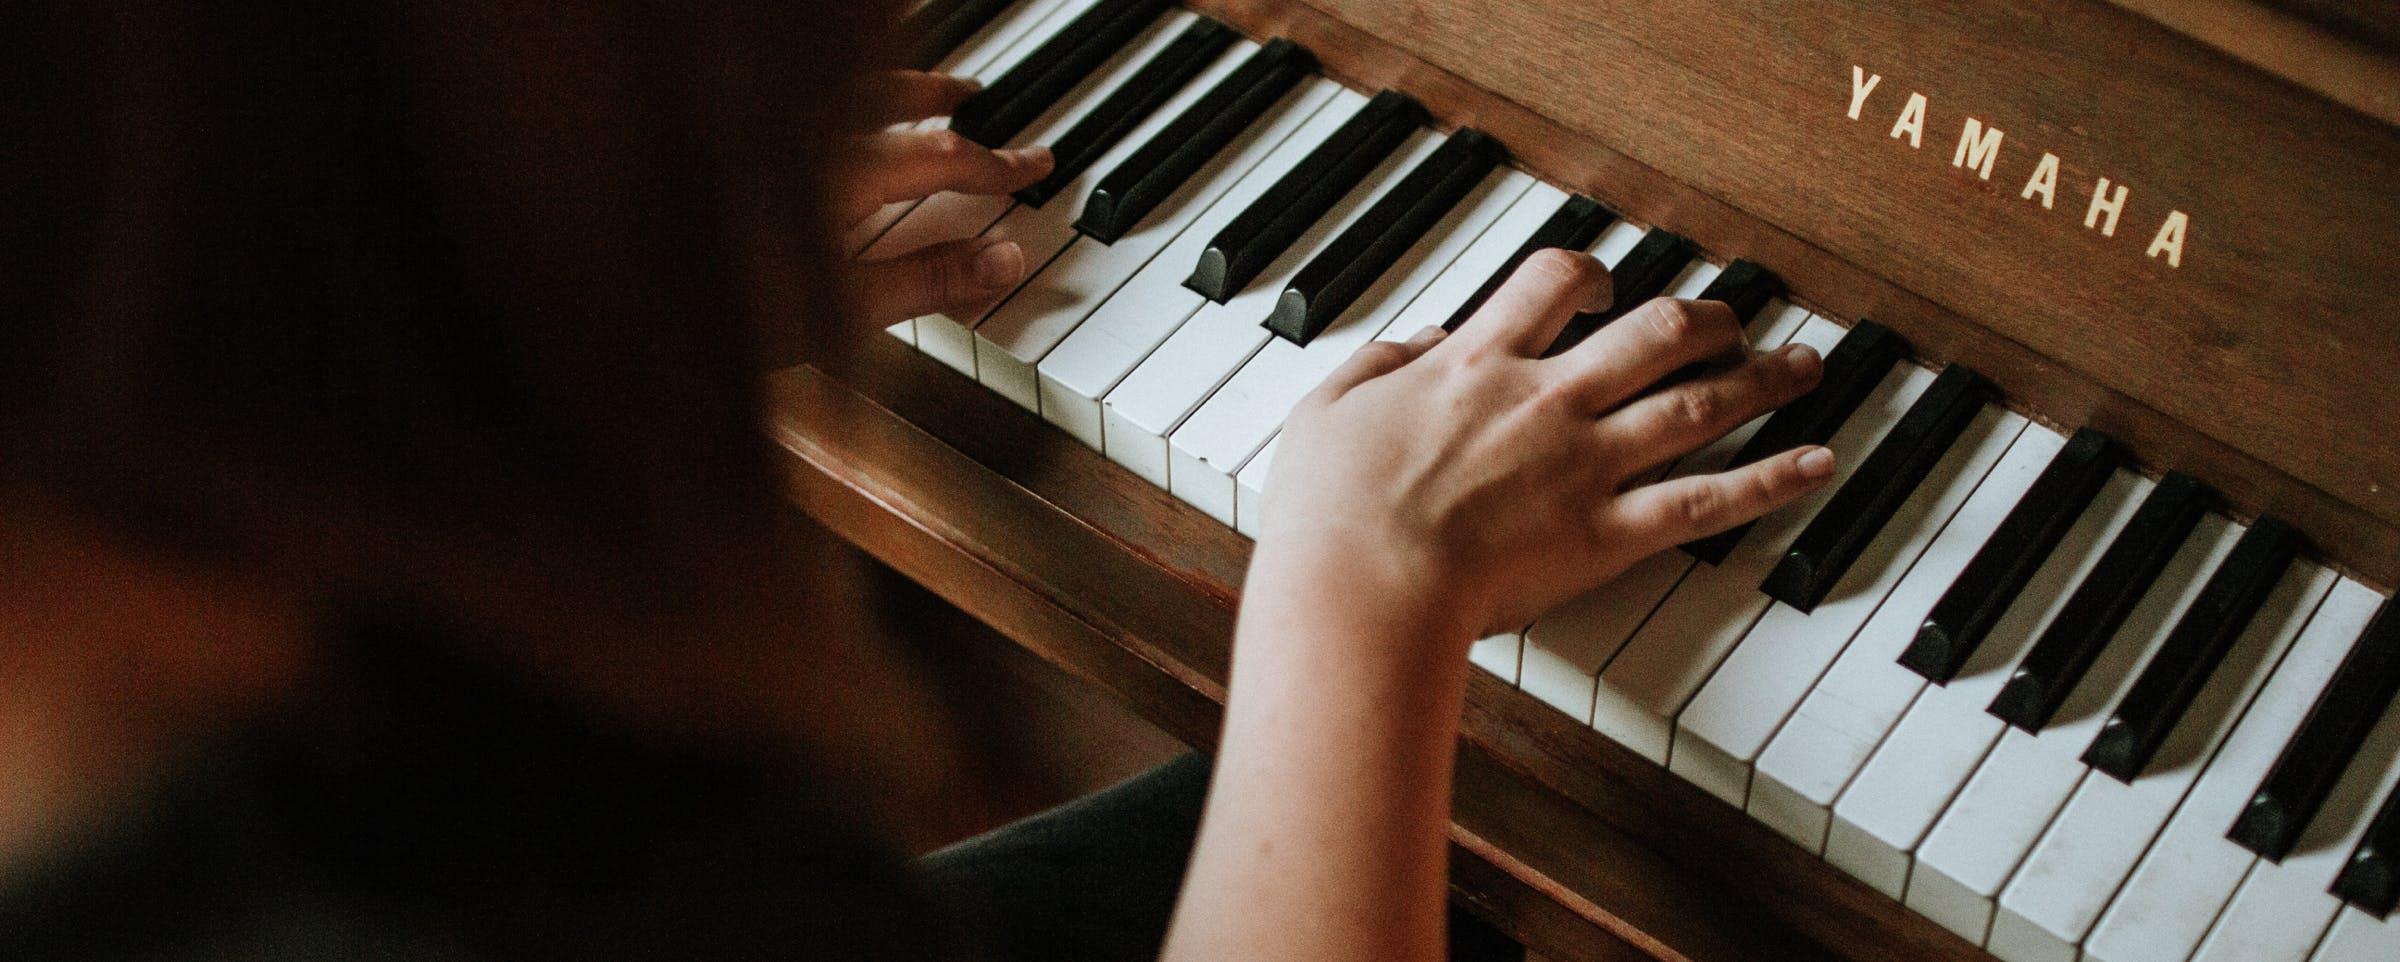 Frau spielt am braunen Yamaha Klavier